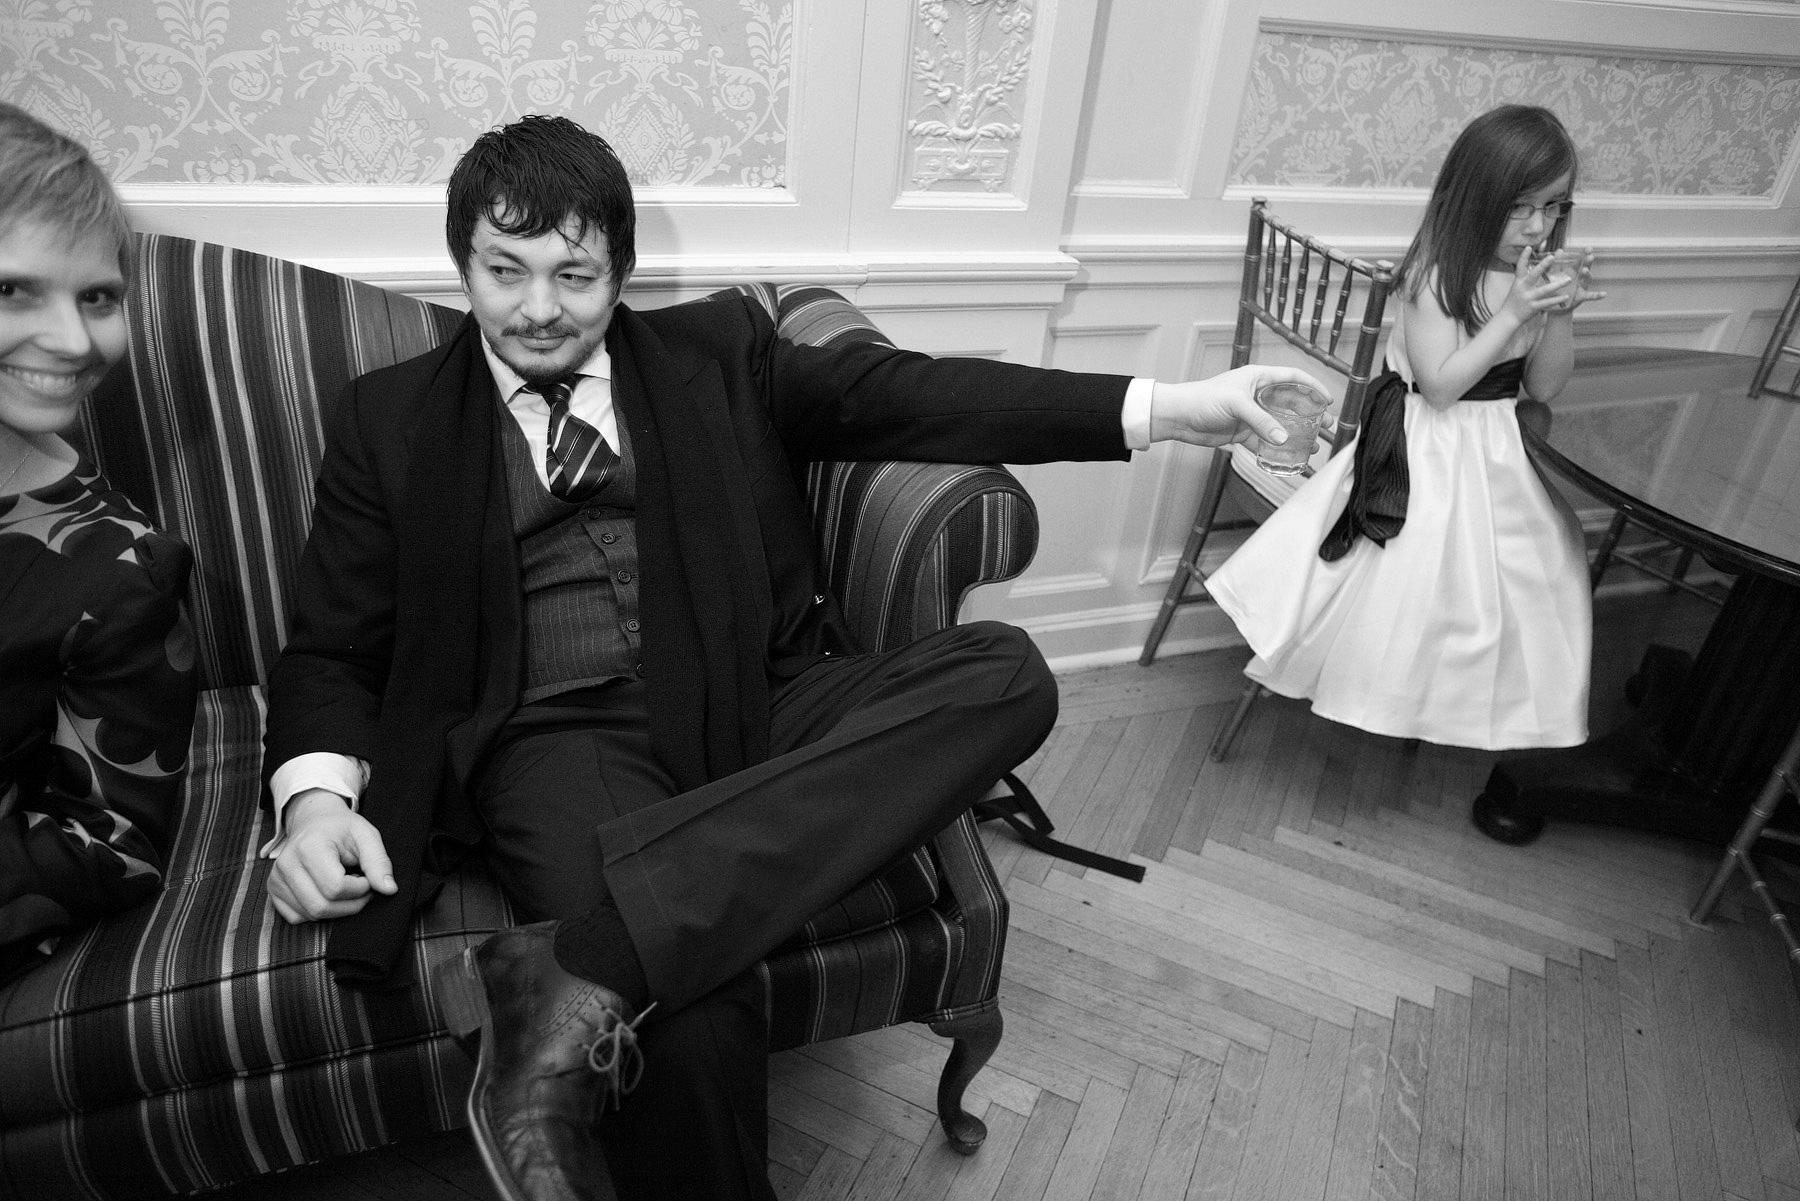 wedding-photography-saint-paul-mark-kegans-663.jpg